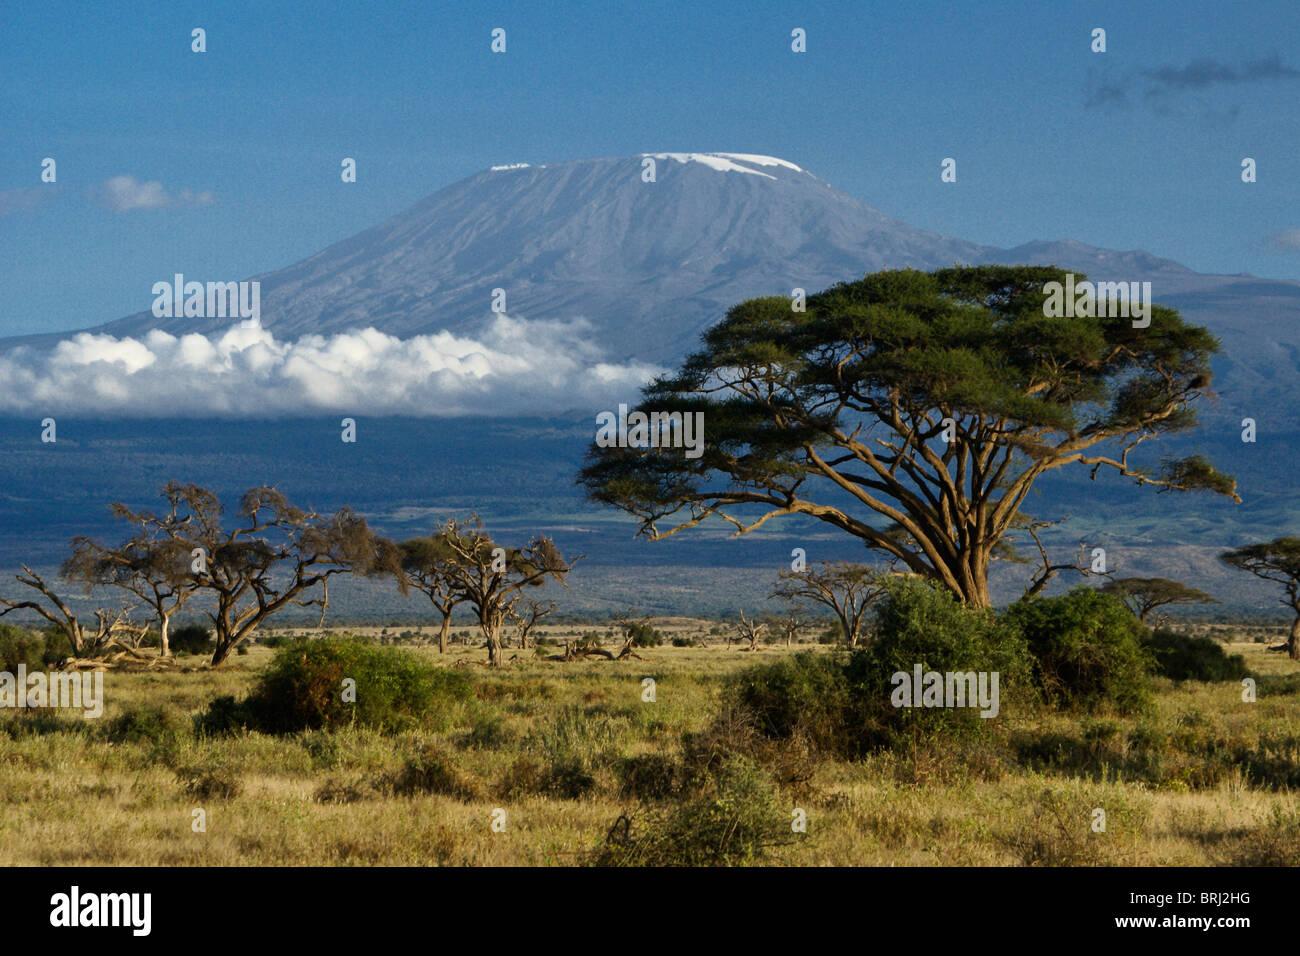 Mount Kilimanjaro, Tanzania, viewed from Amboseli National Park, Kenya - Stock Image